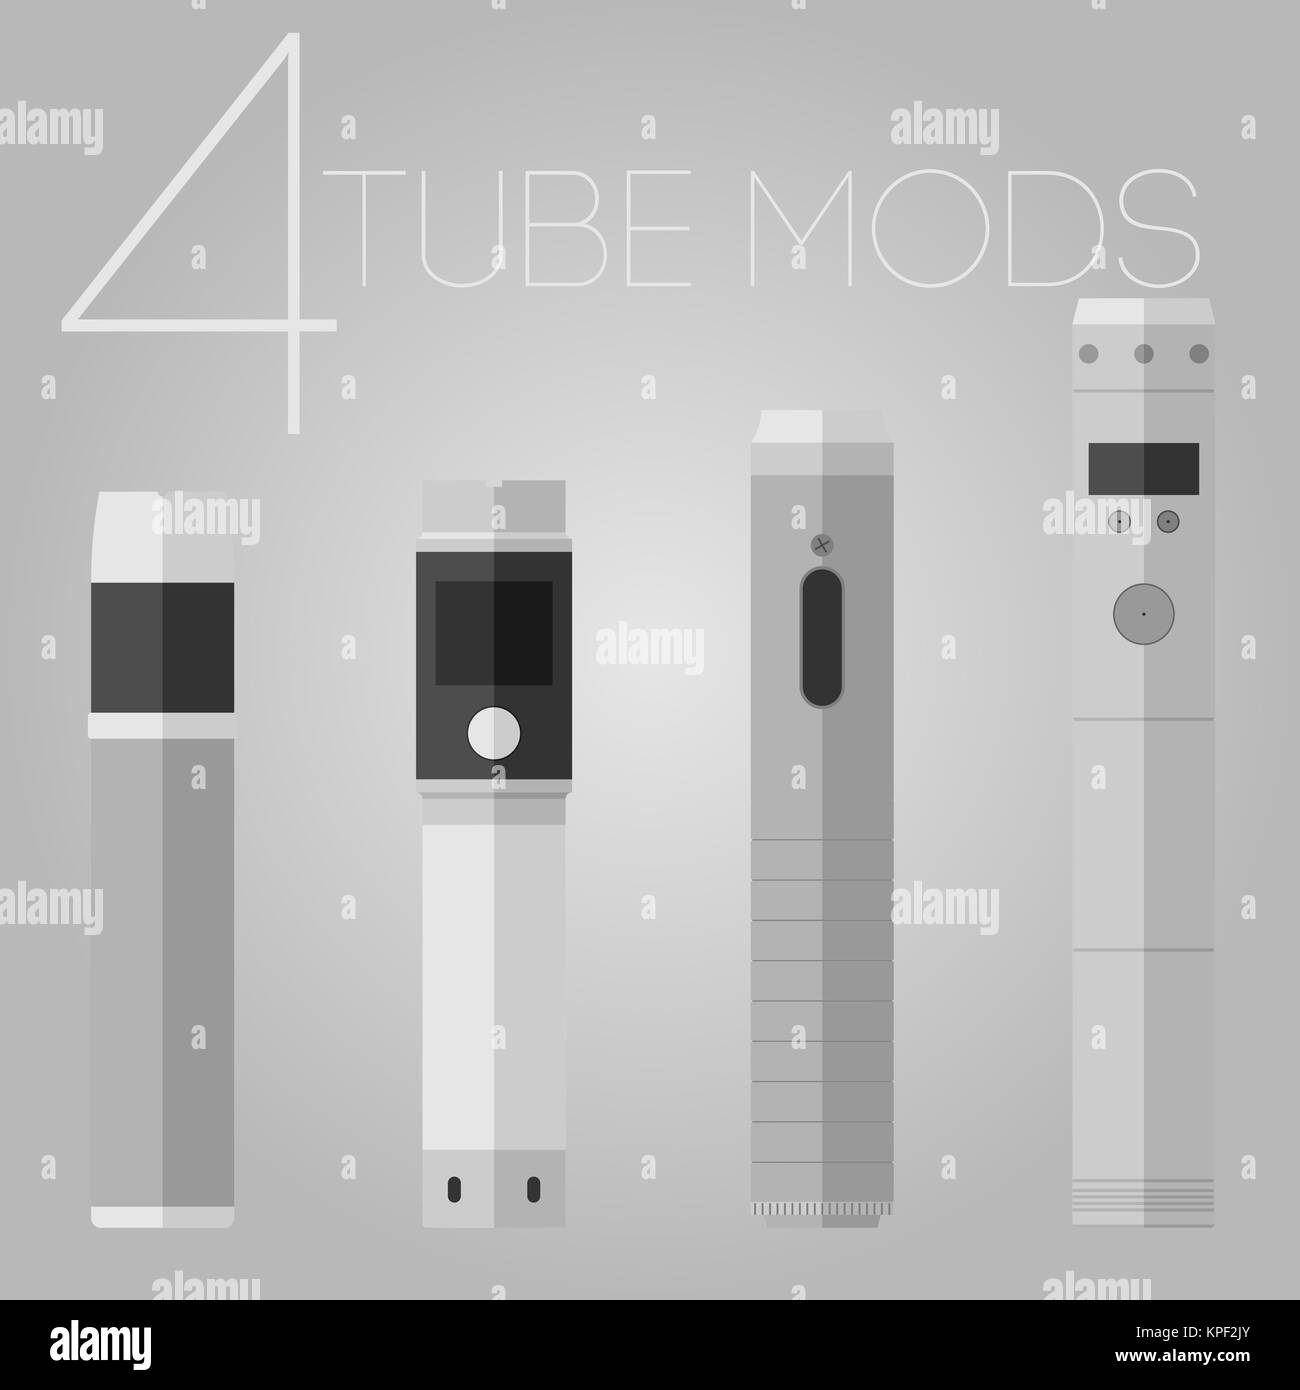 4 mechanical mods icons set - Stock Image